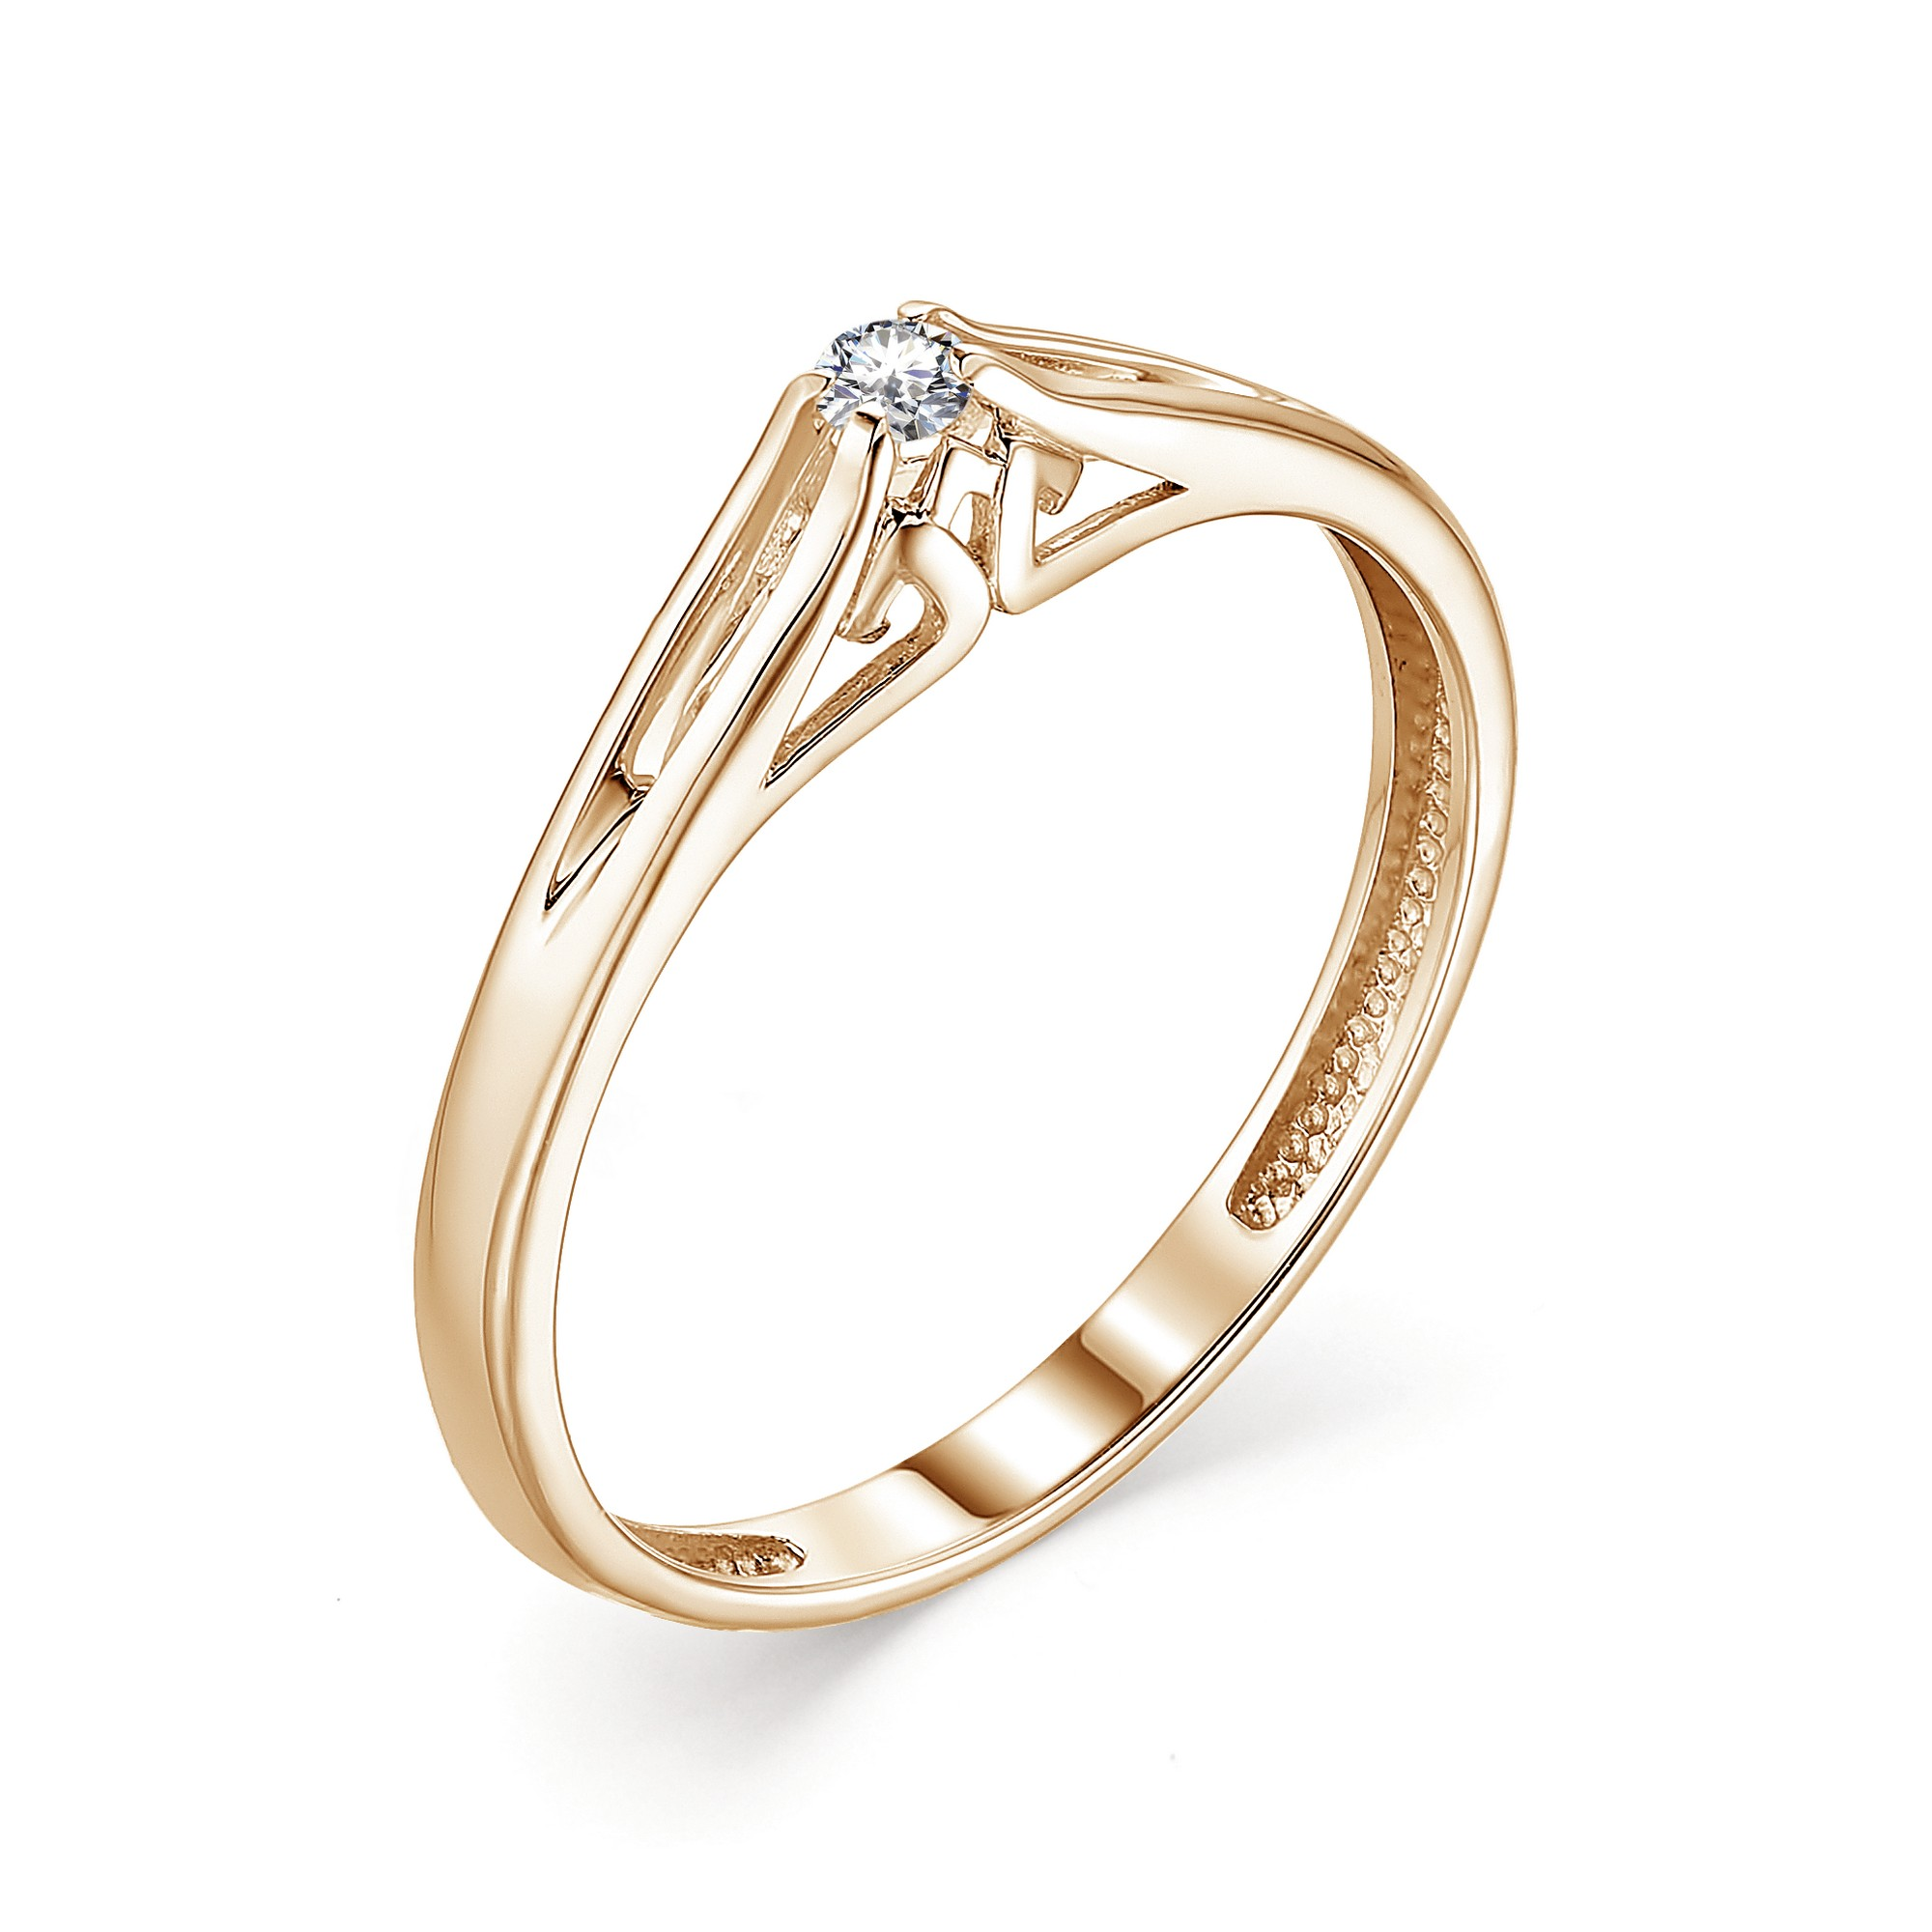 картинка кольцо 13343-100 1 бриллиант круг 57 0,046 20-25 3/6а 13343-100